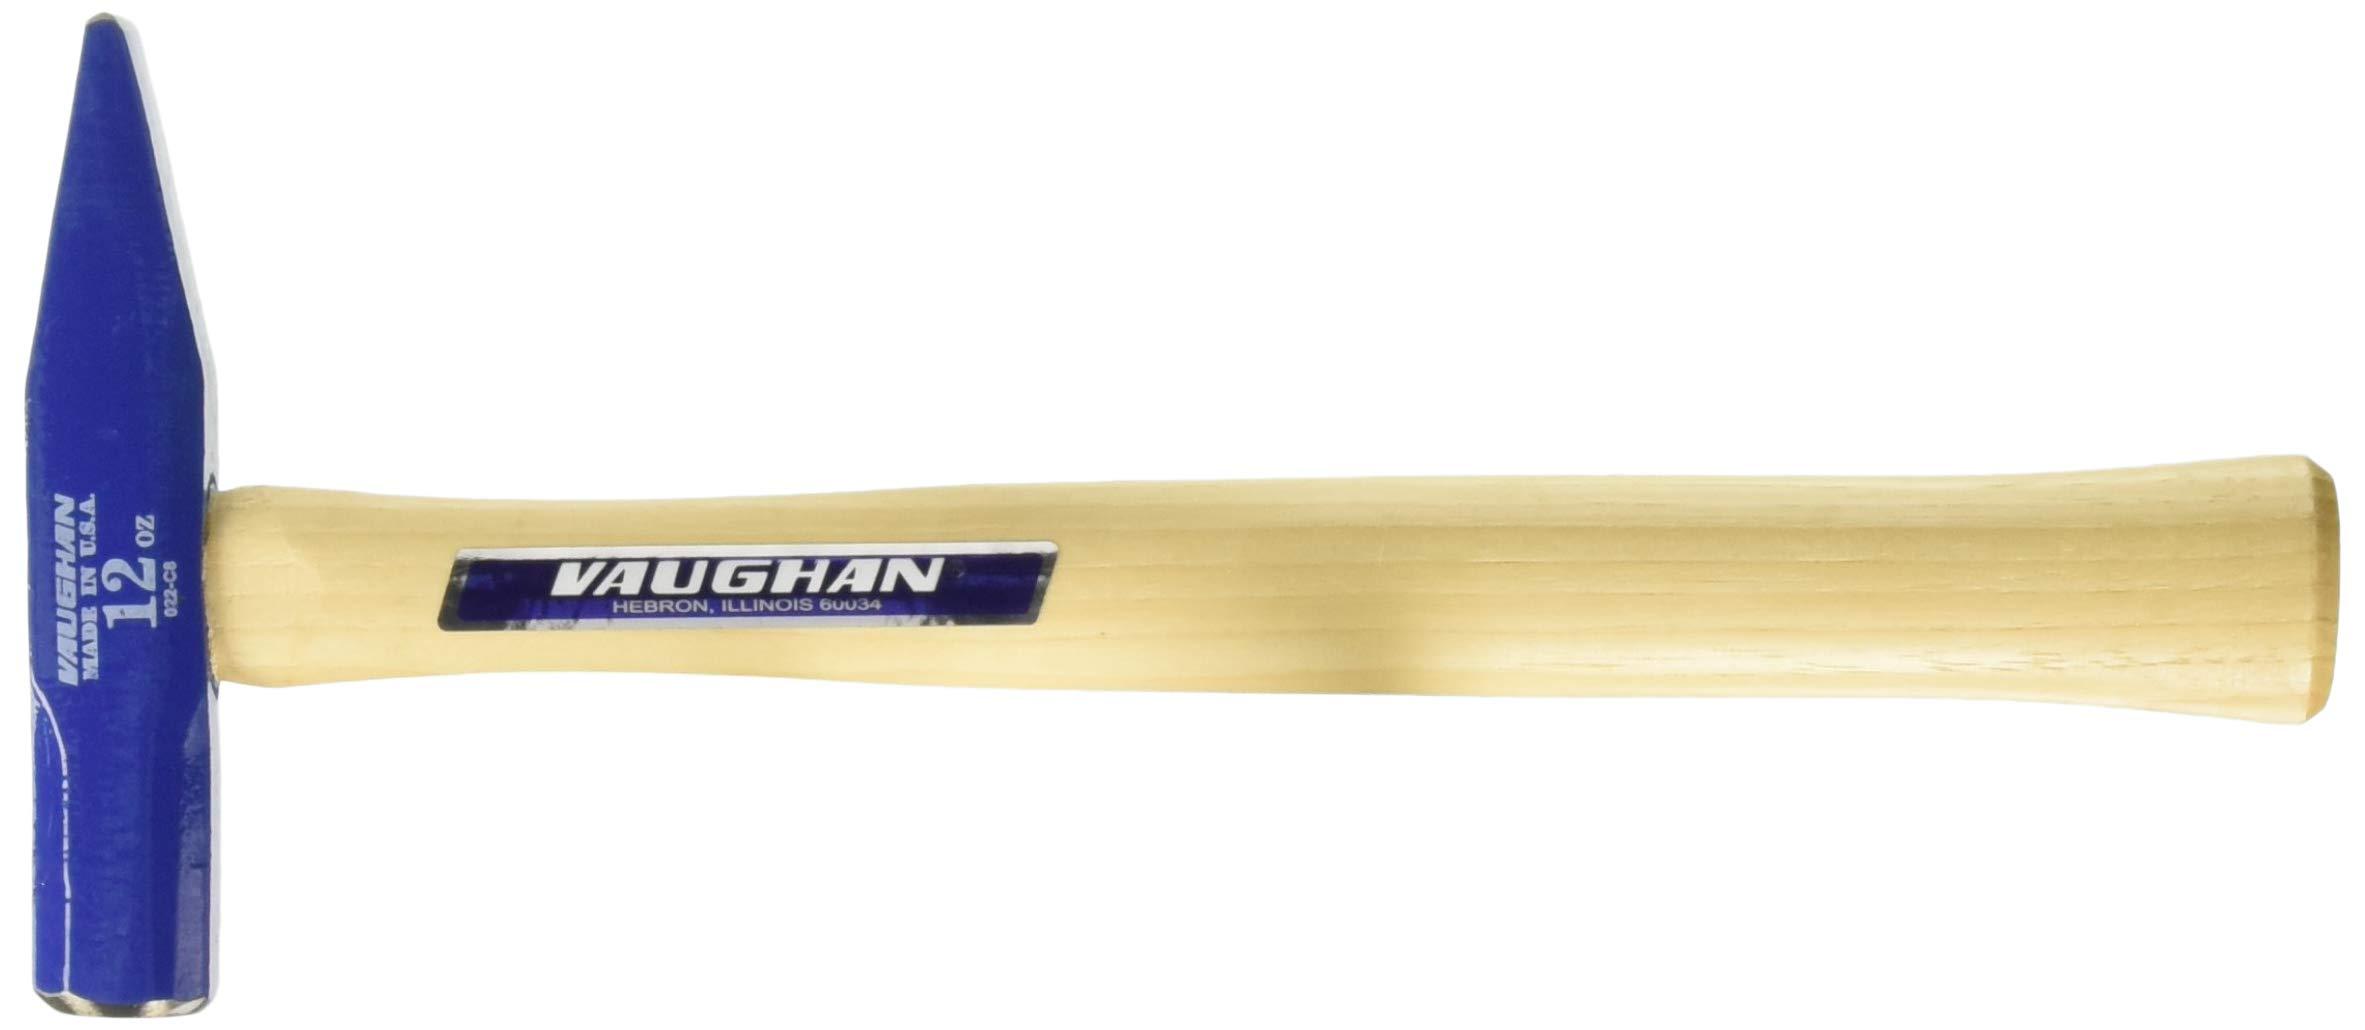 Vaughan 168 10 Tinners Riveting 12 Ounce